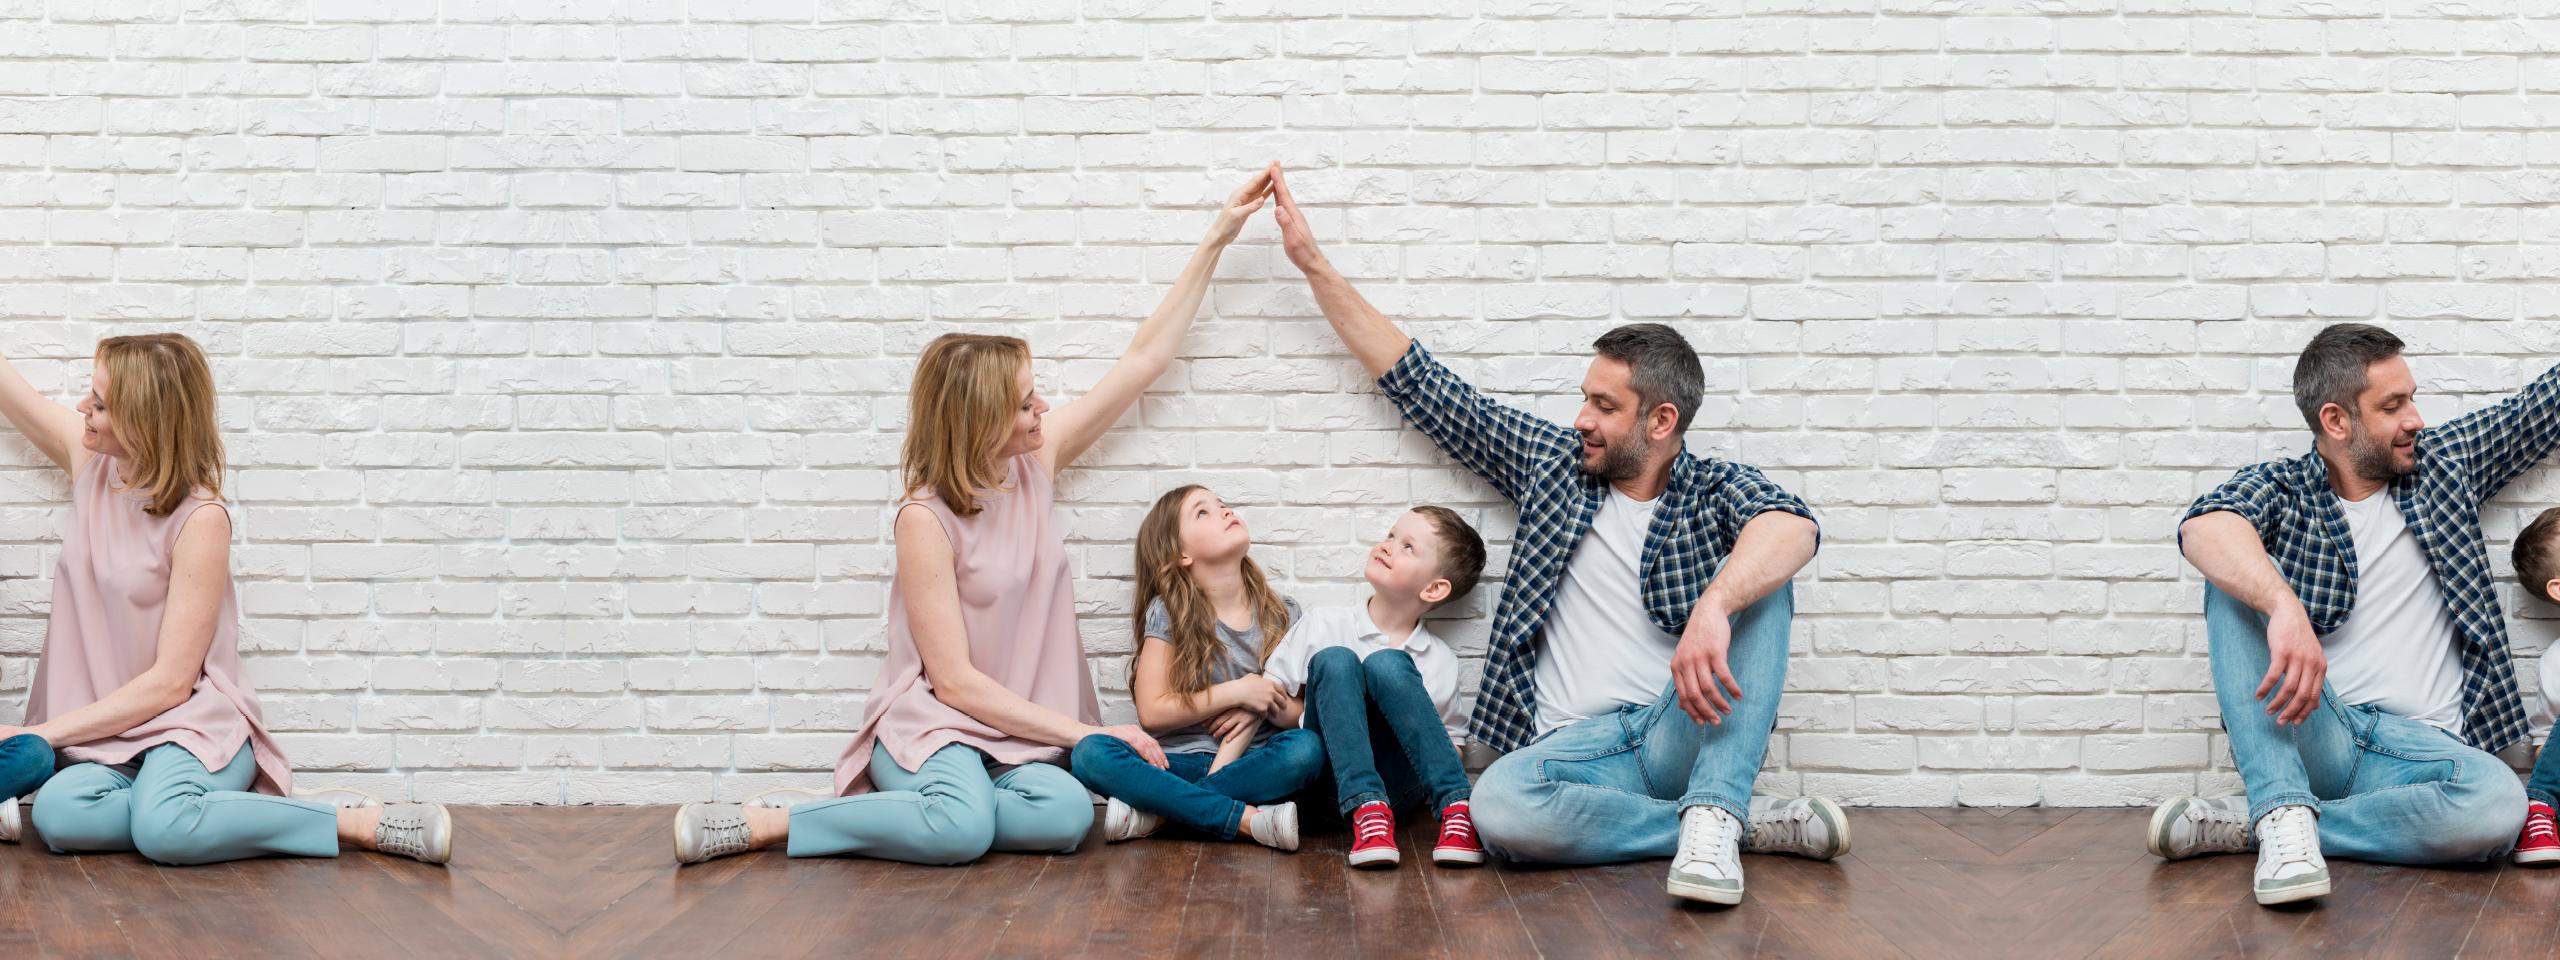 right-turn-realty-family-experience